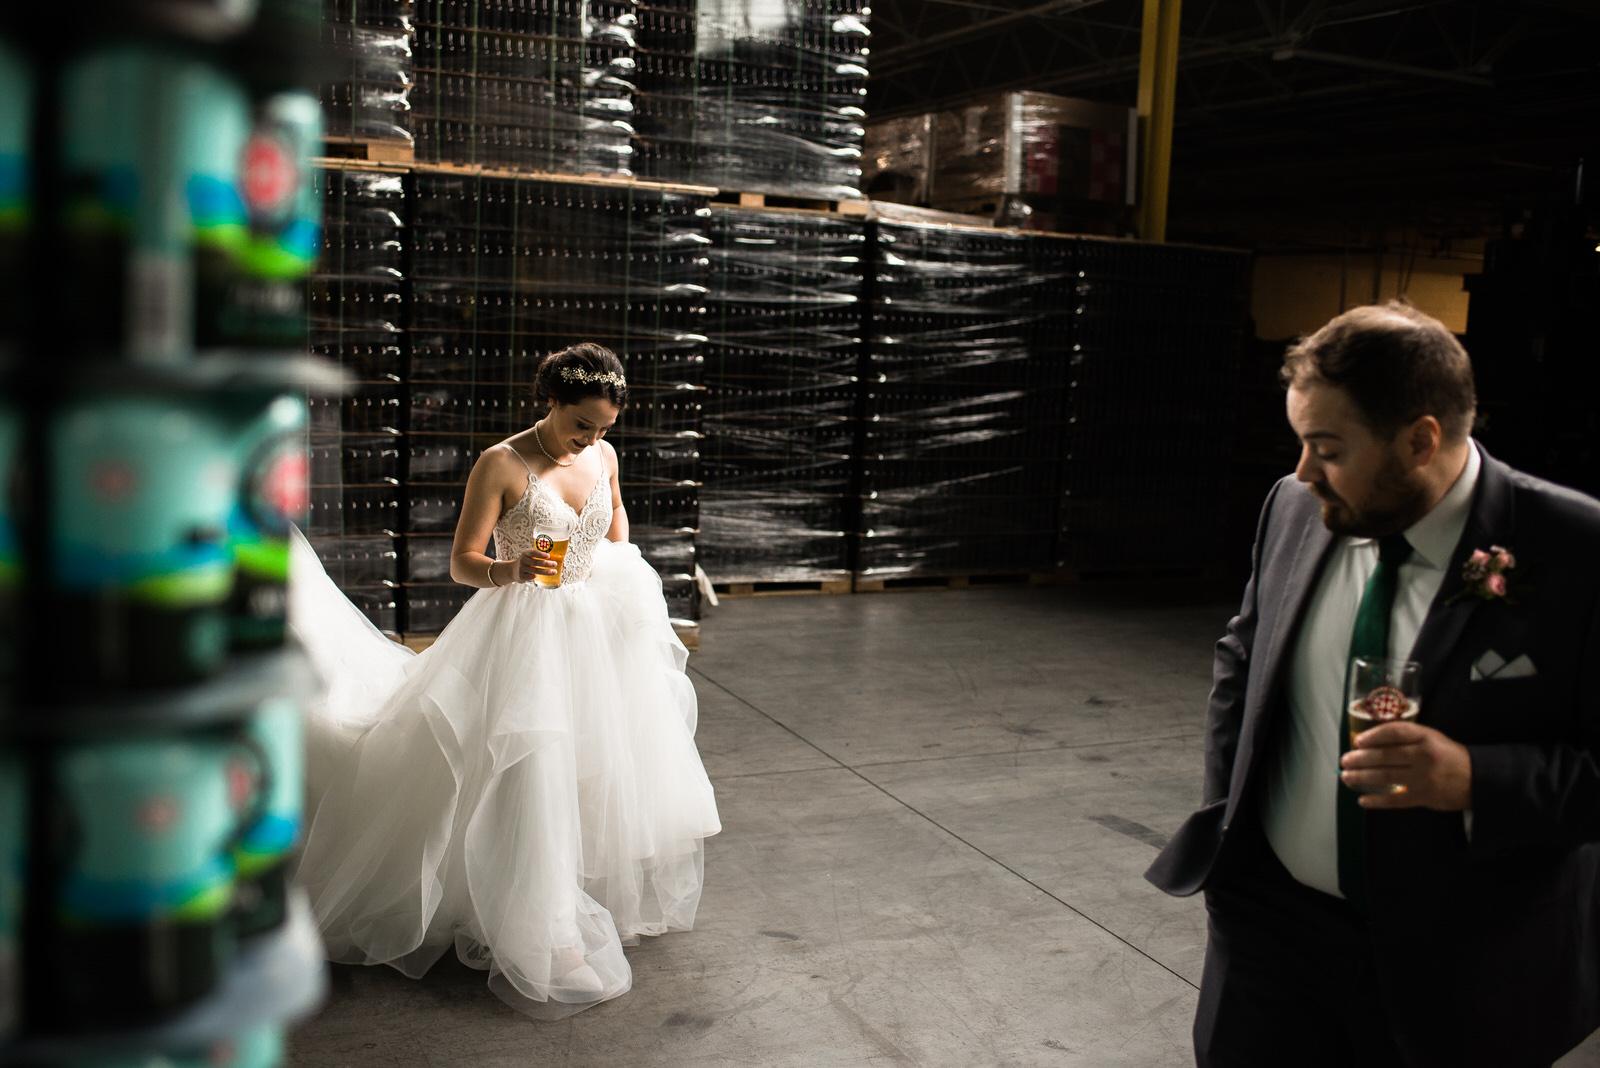 rainy day brewery wedding - HIGHLAND BREWING COMPANY | ASHEVILLE NC